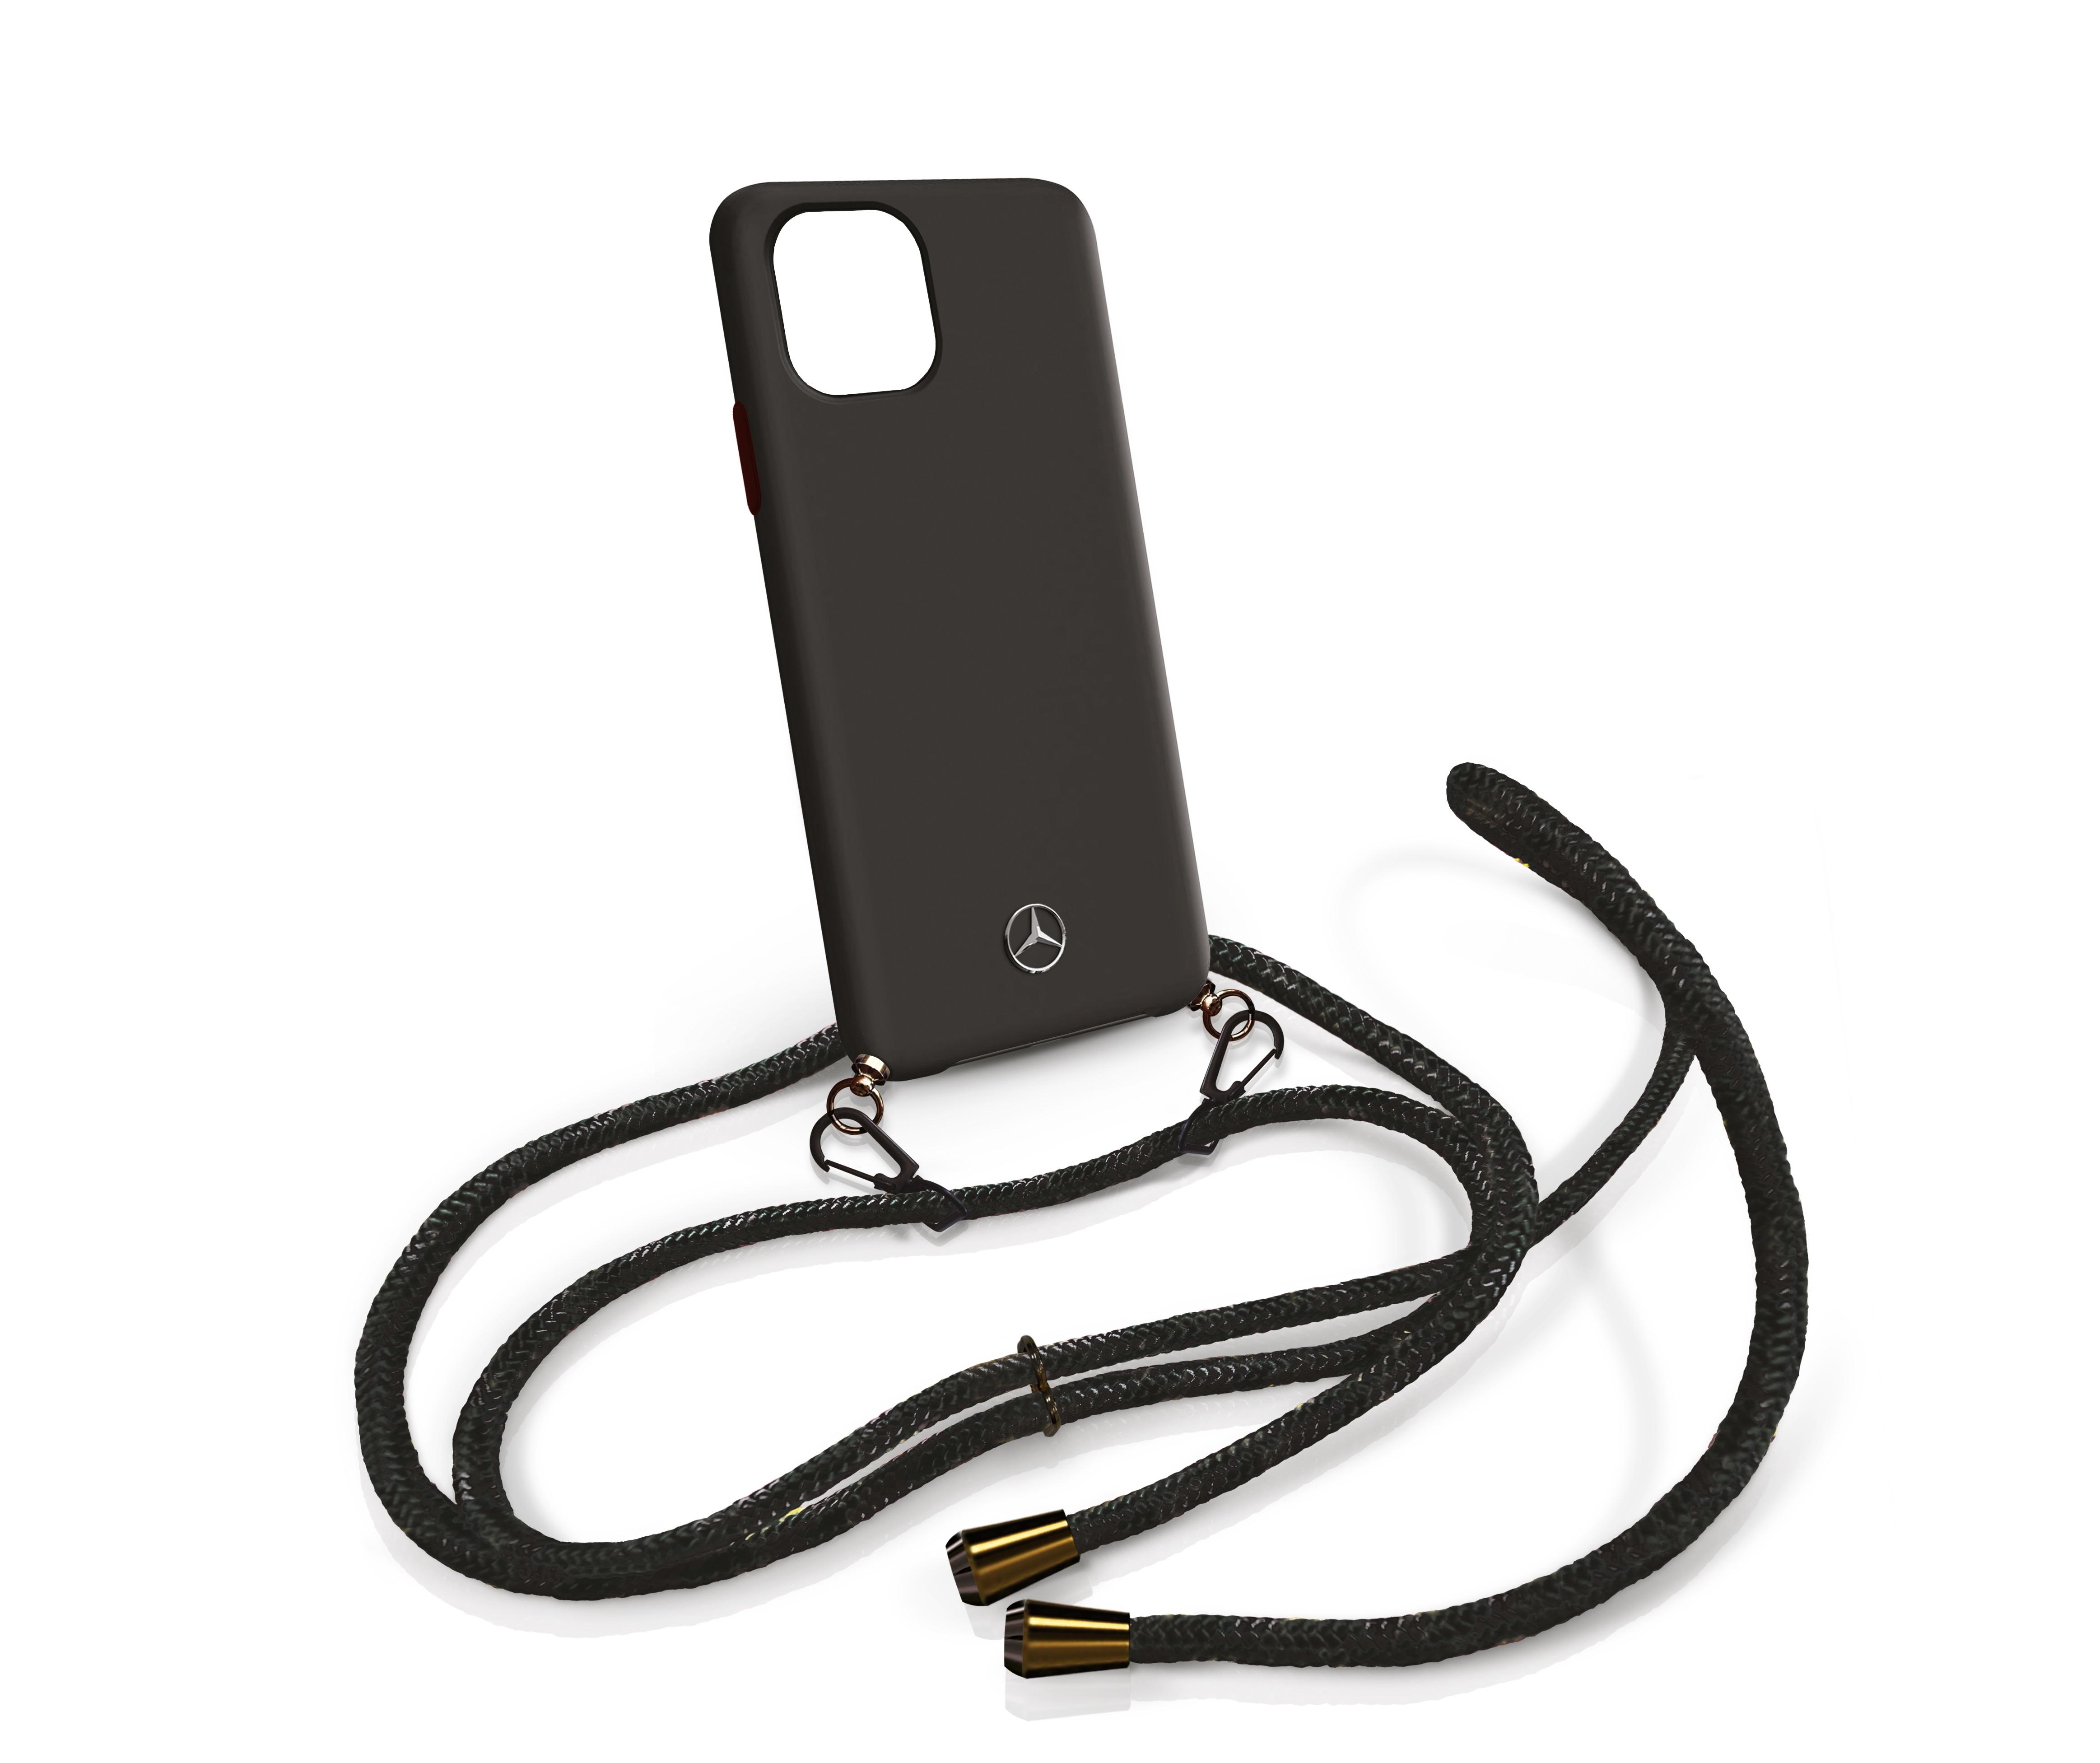 Hoes voor iPhone® 11 met ketting